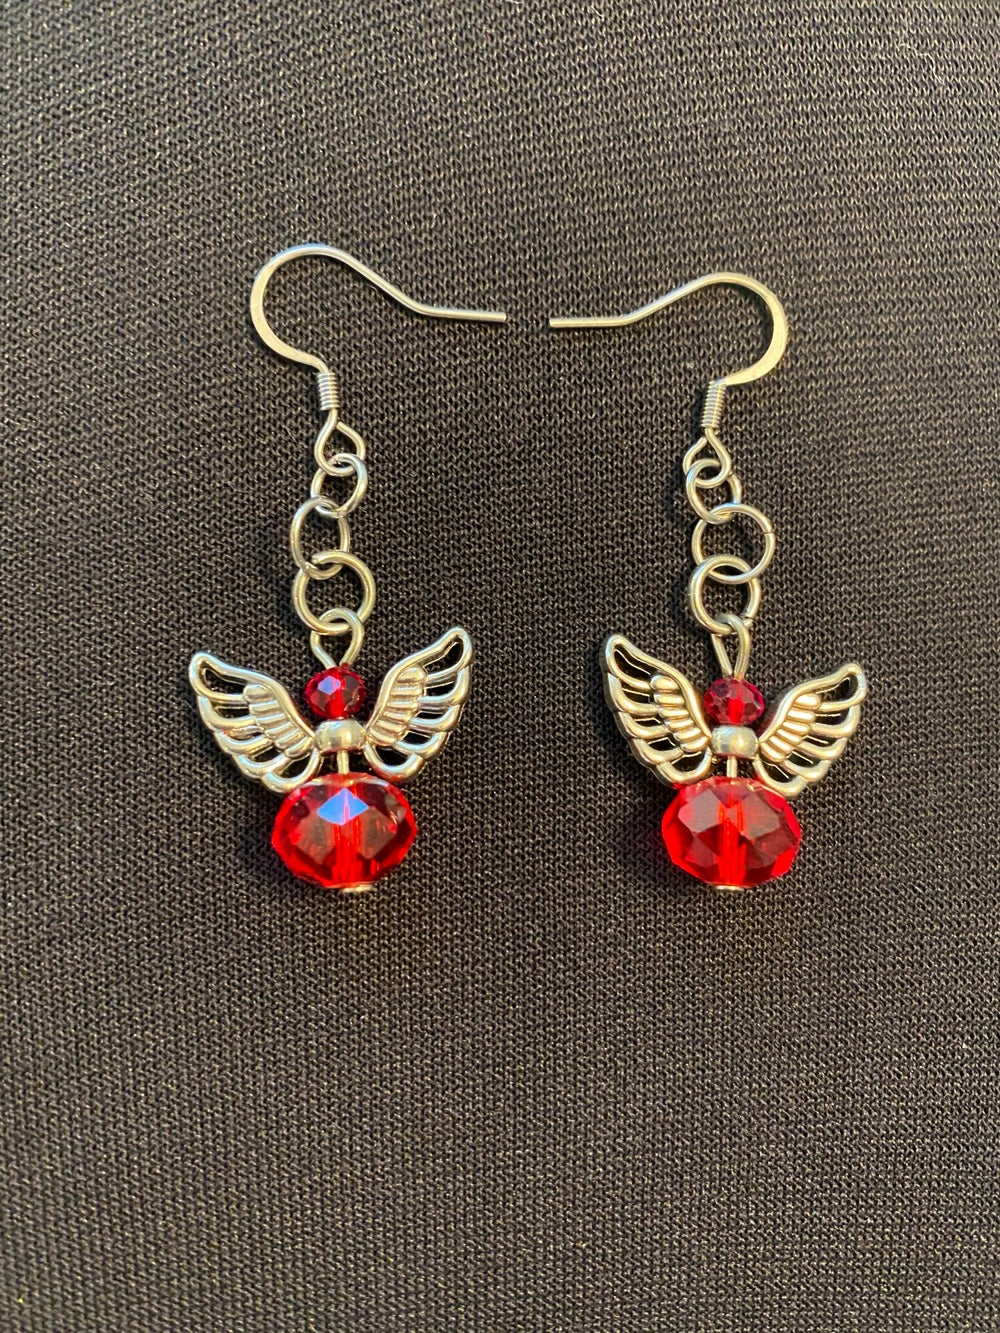 Angel Glass Birthstone Earrings